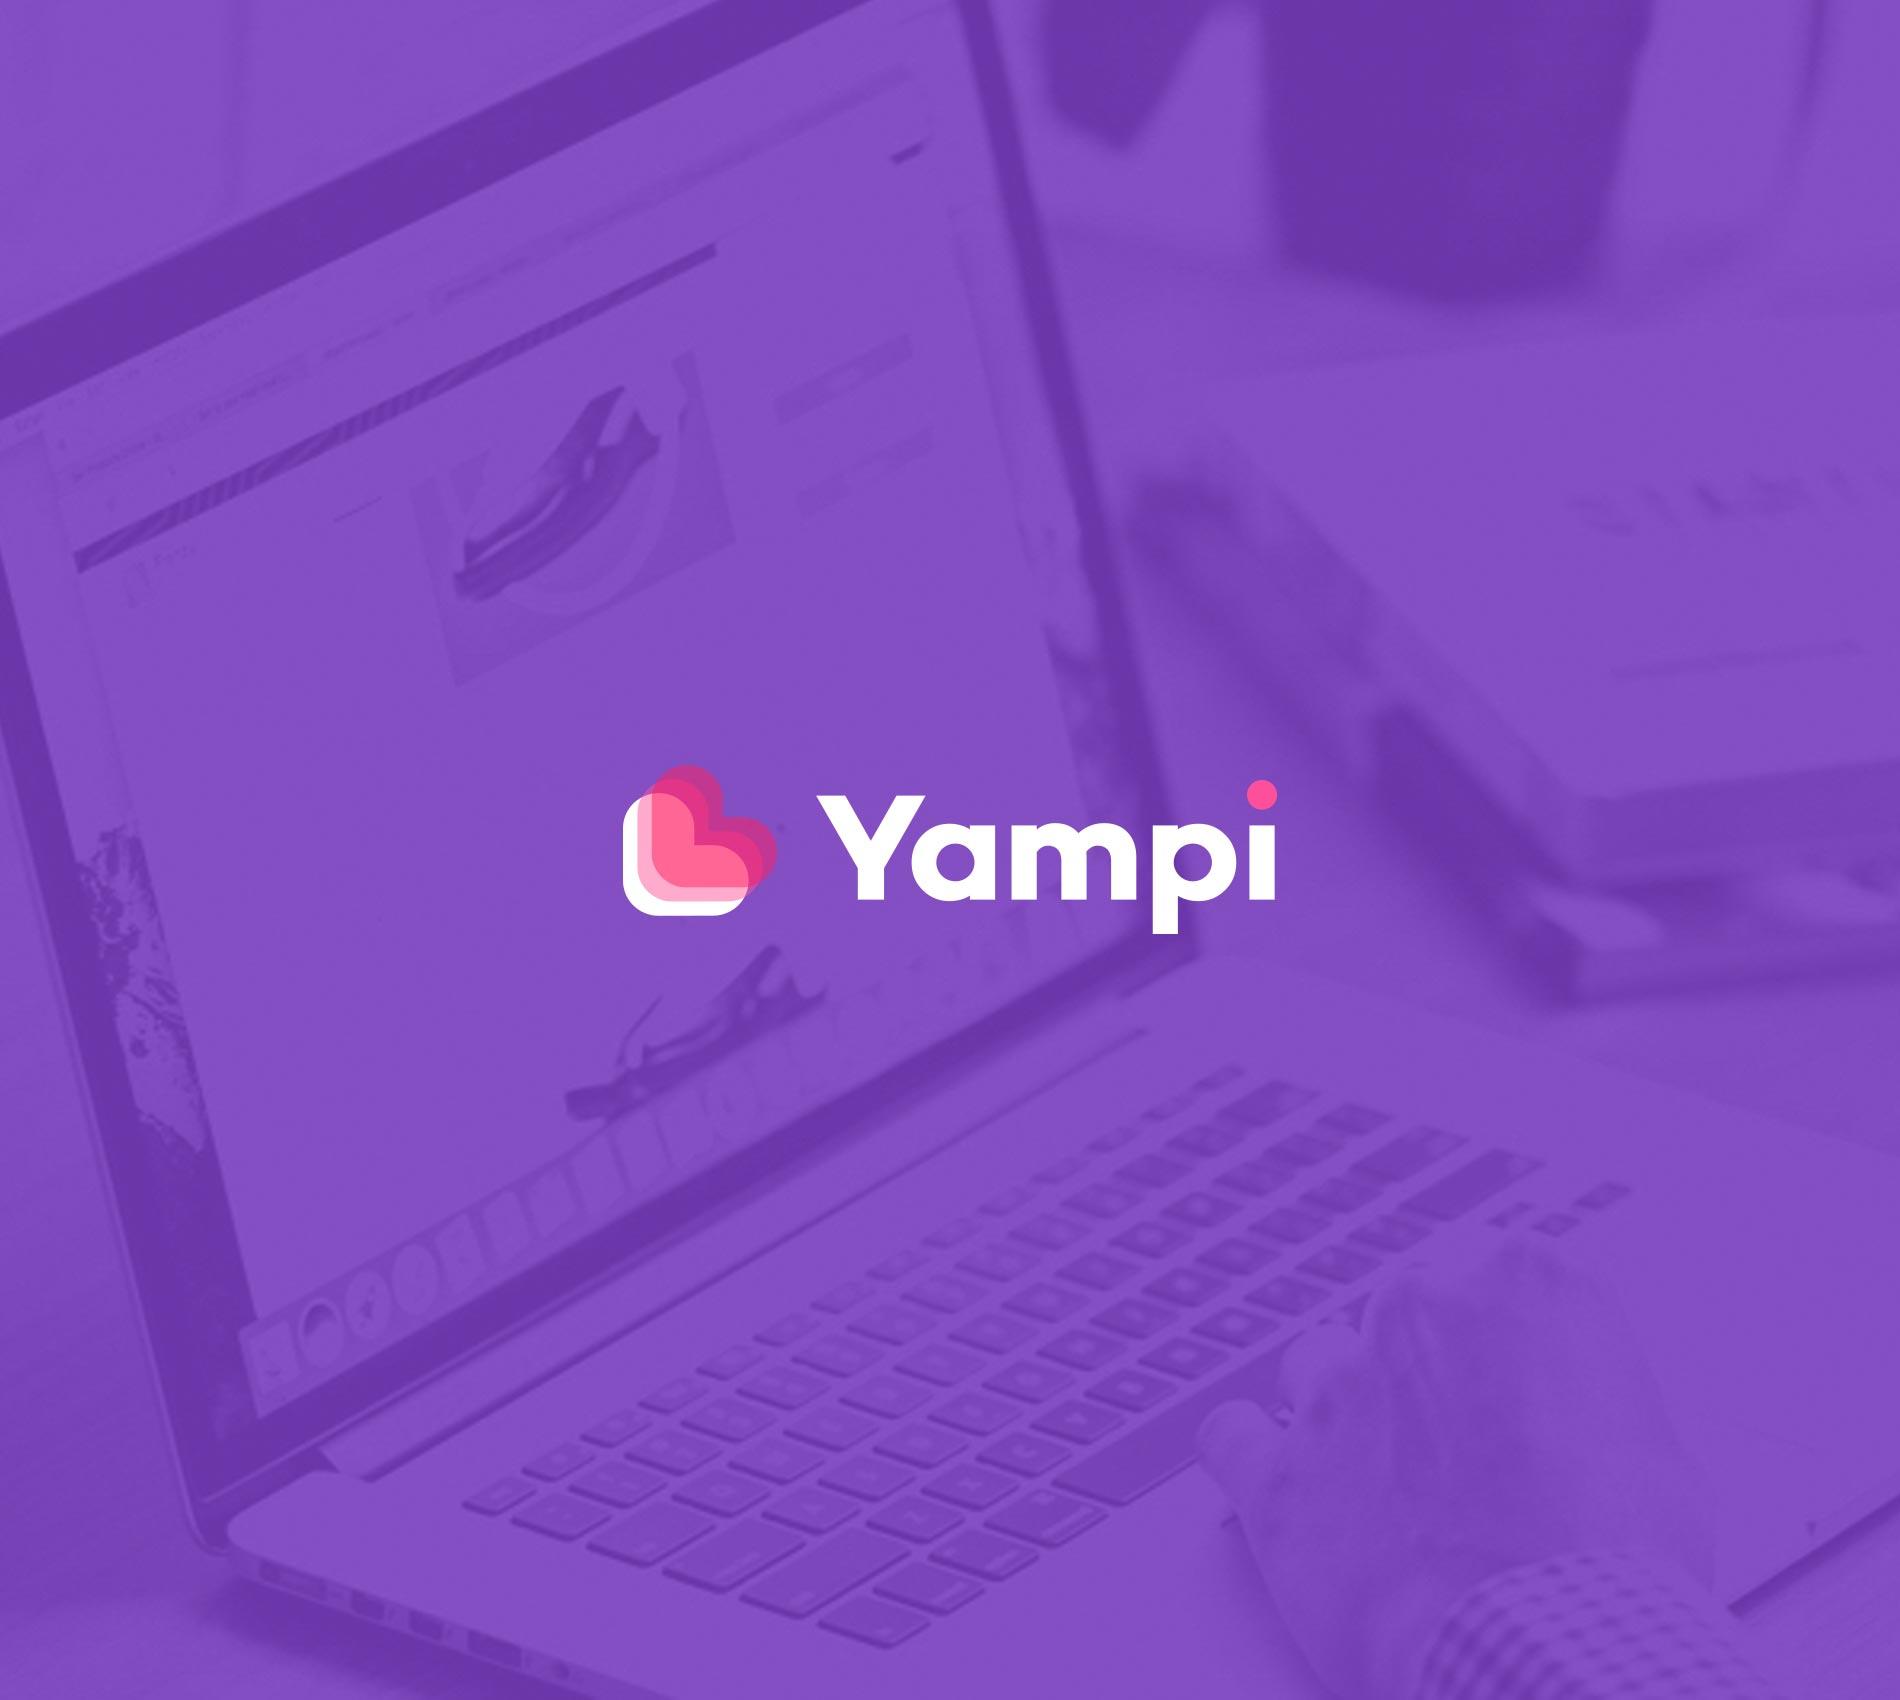 PagBrasil integrates with Yampi platform